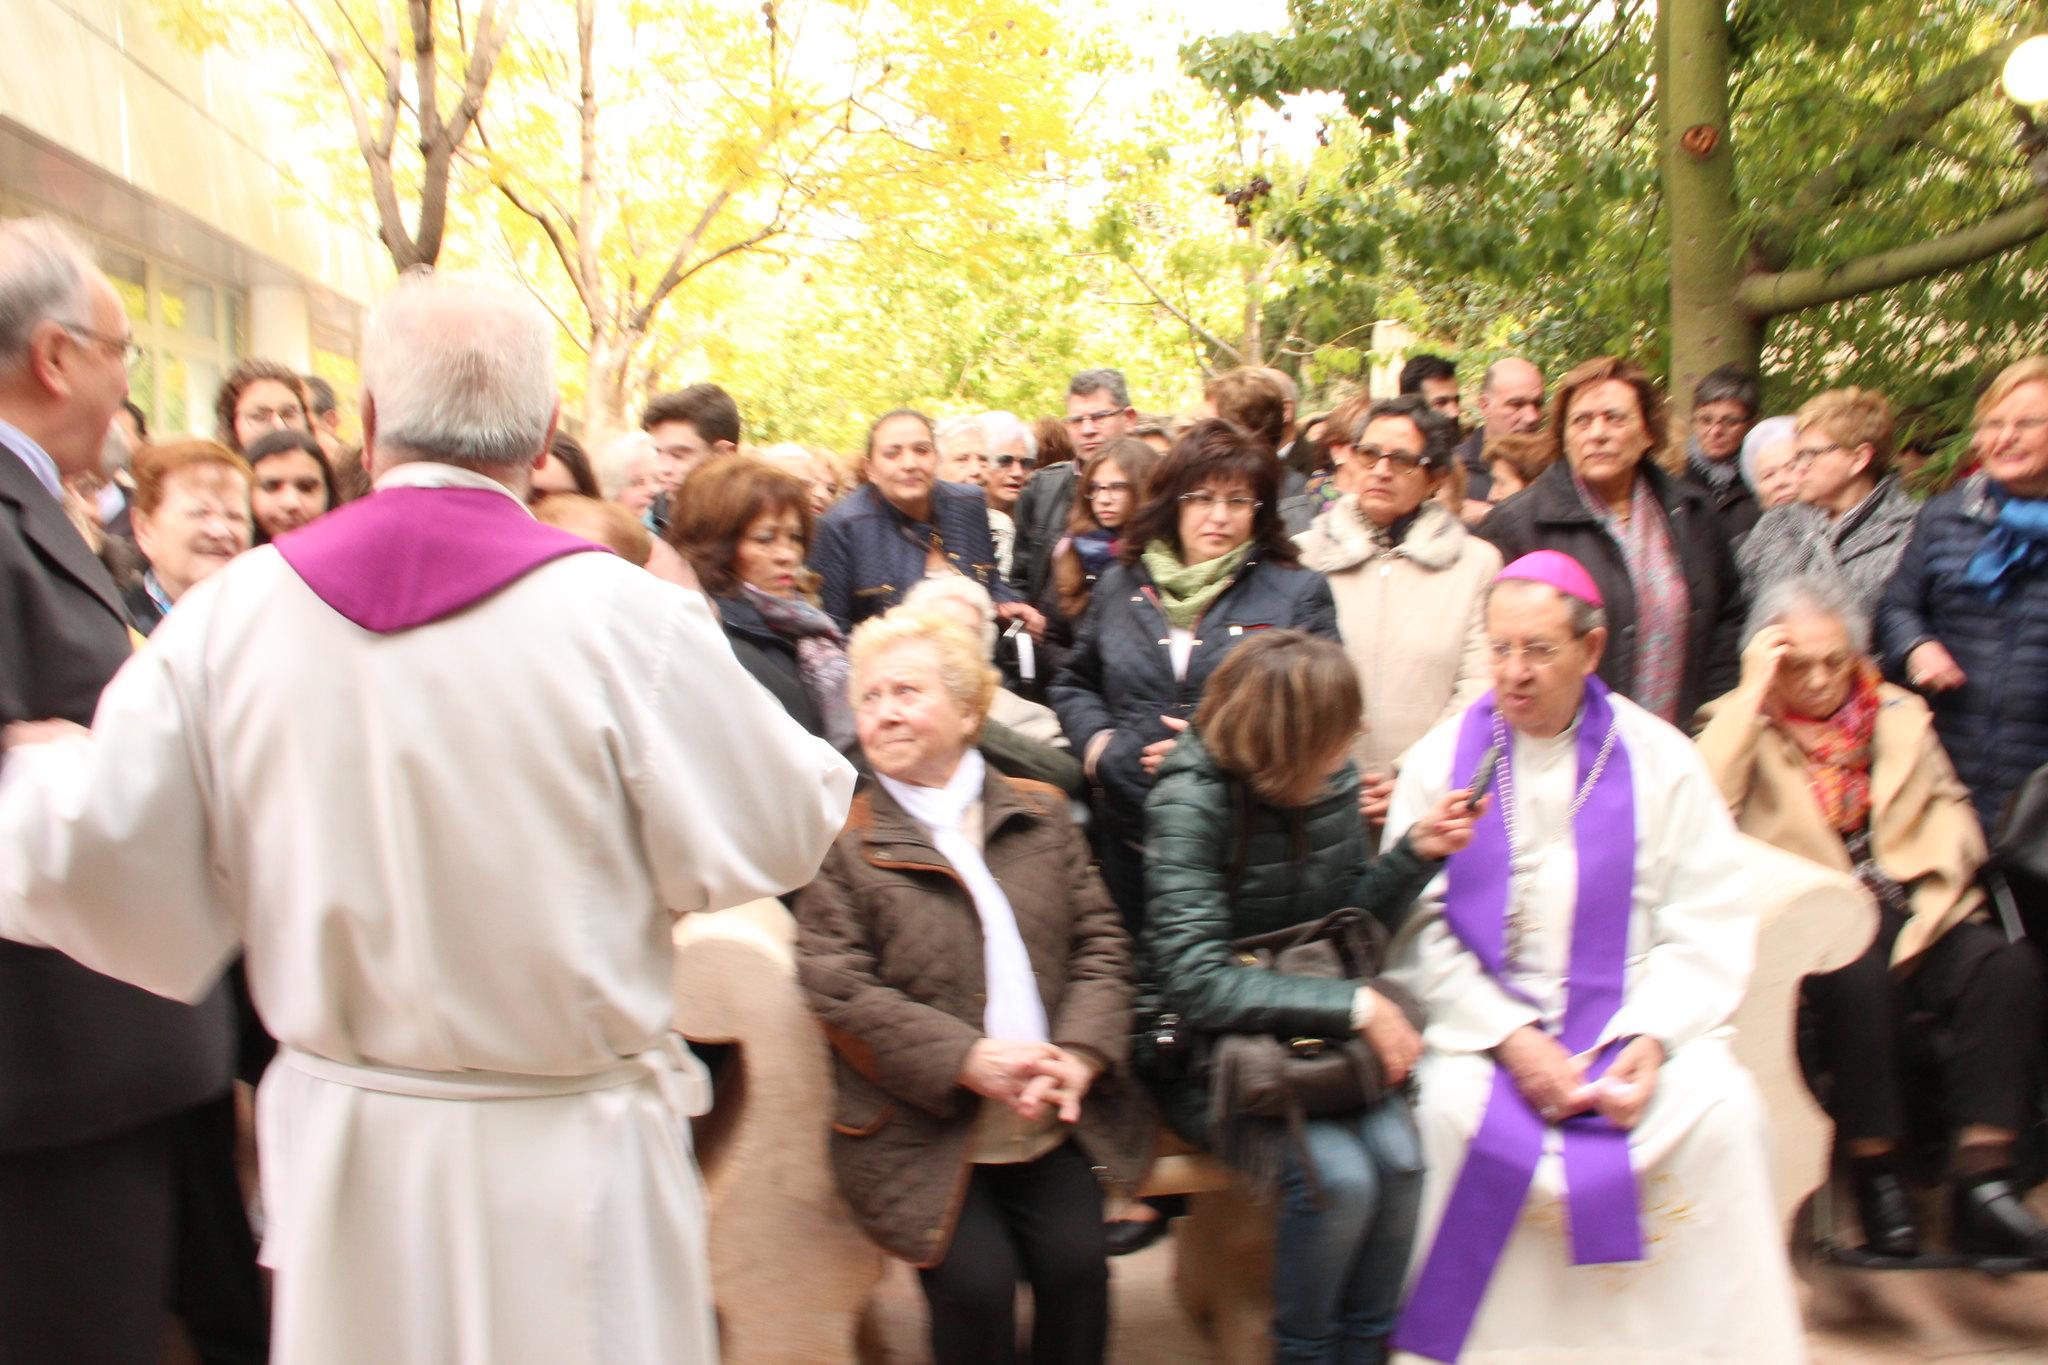 (2016-02-13) - Inauguración Virgen De Lourdes, La Molineta - Archivo La Molineta (066)